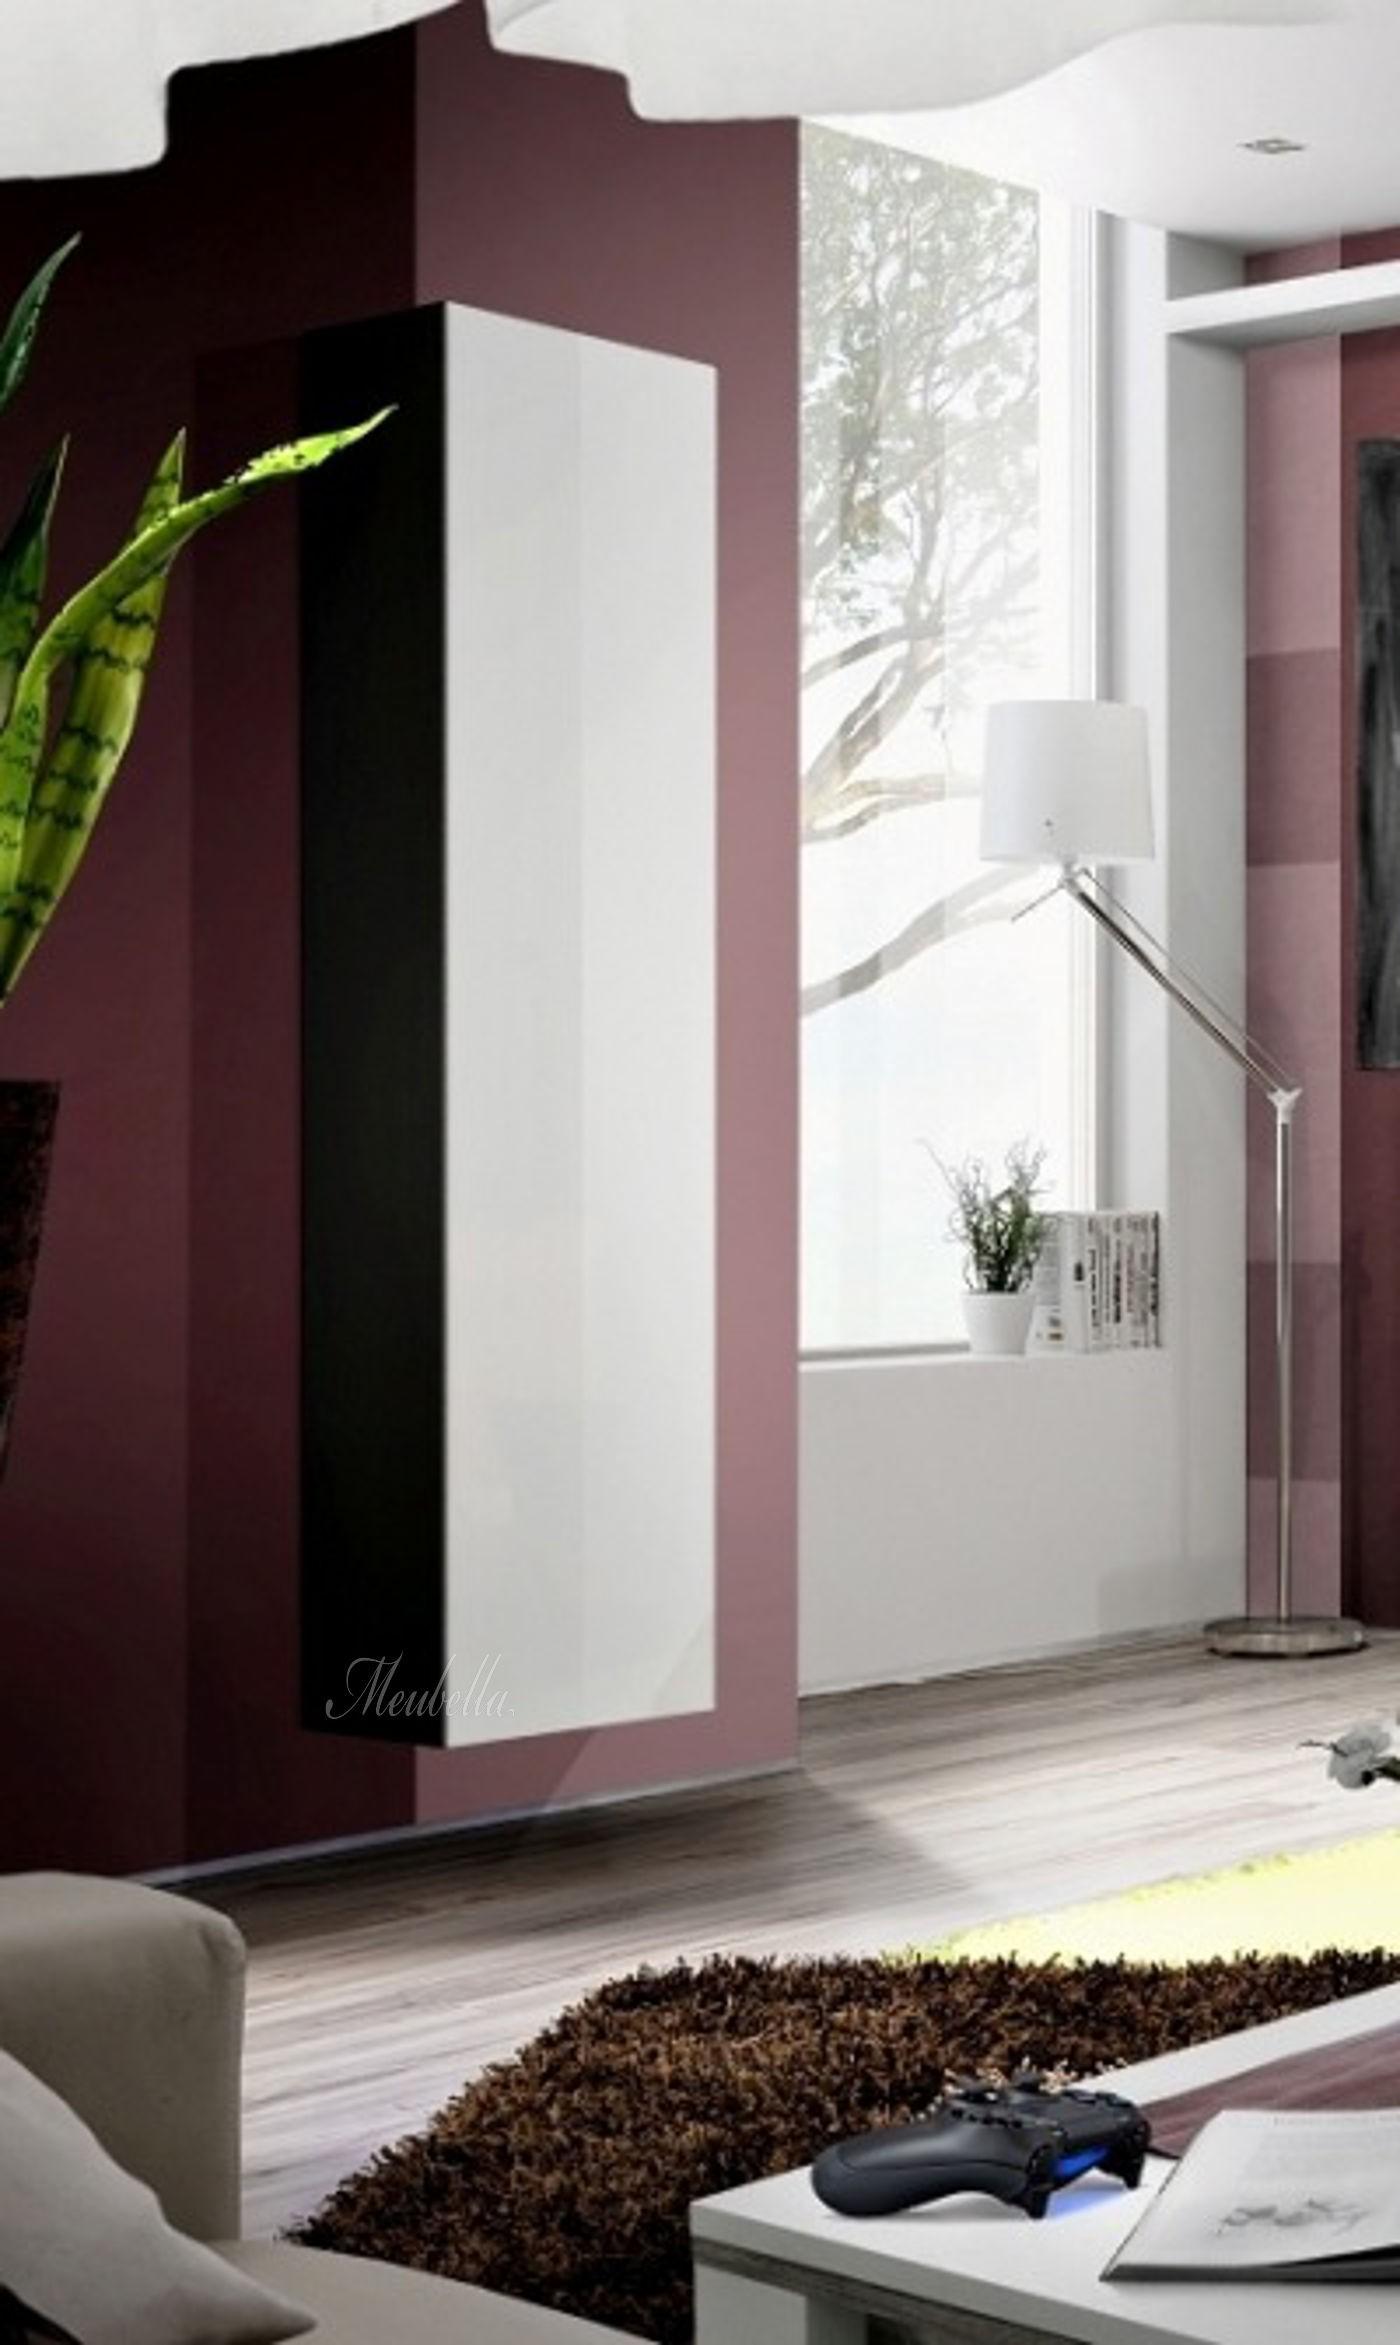 Kast Nina 4 - Wit met zwart - Kasten - Kasten en vitrinekasten ...